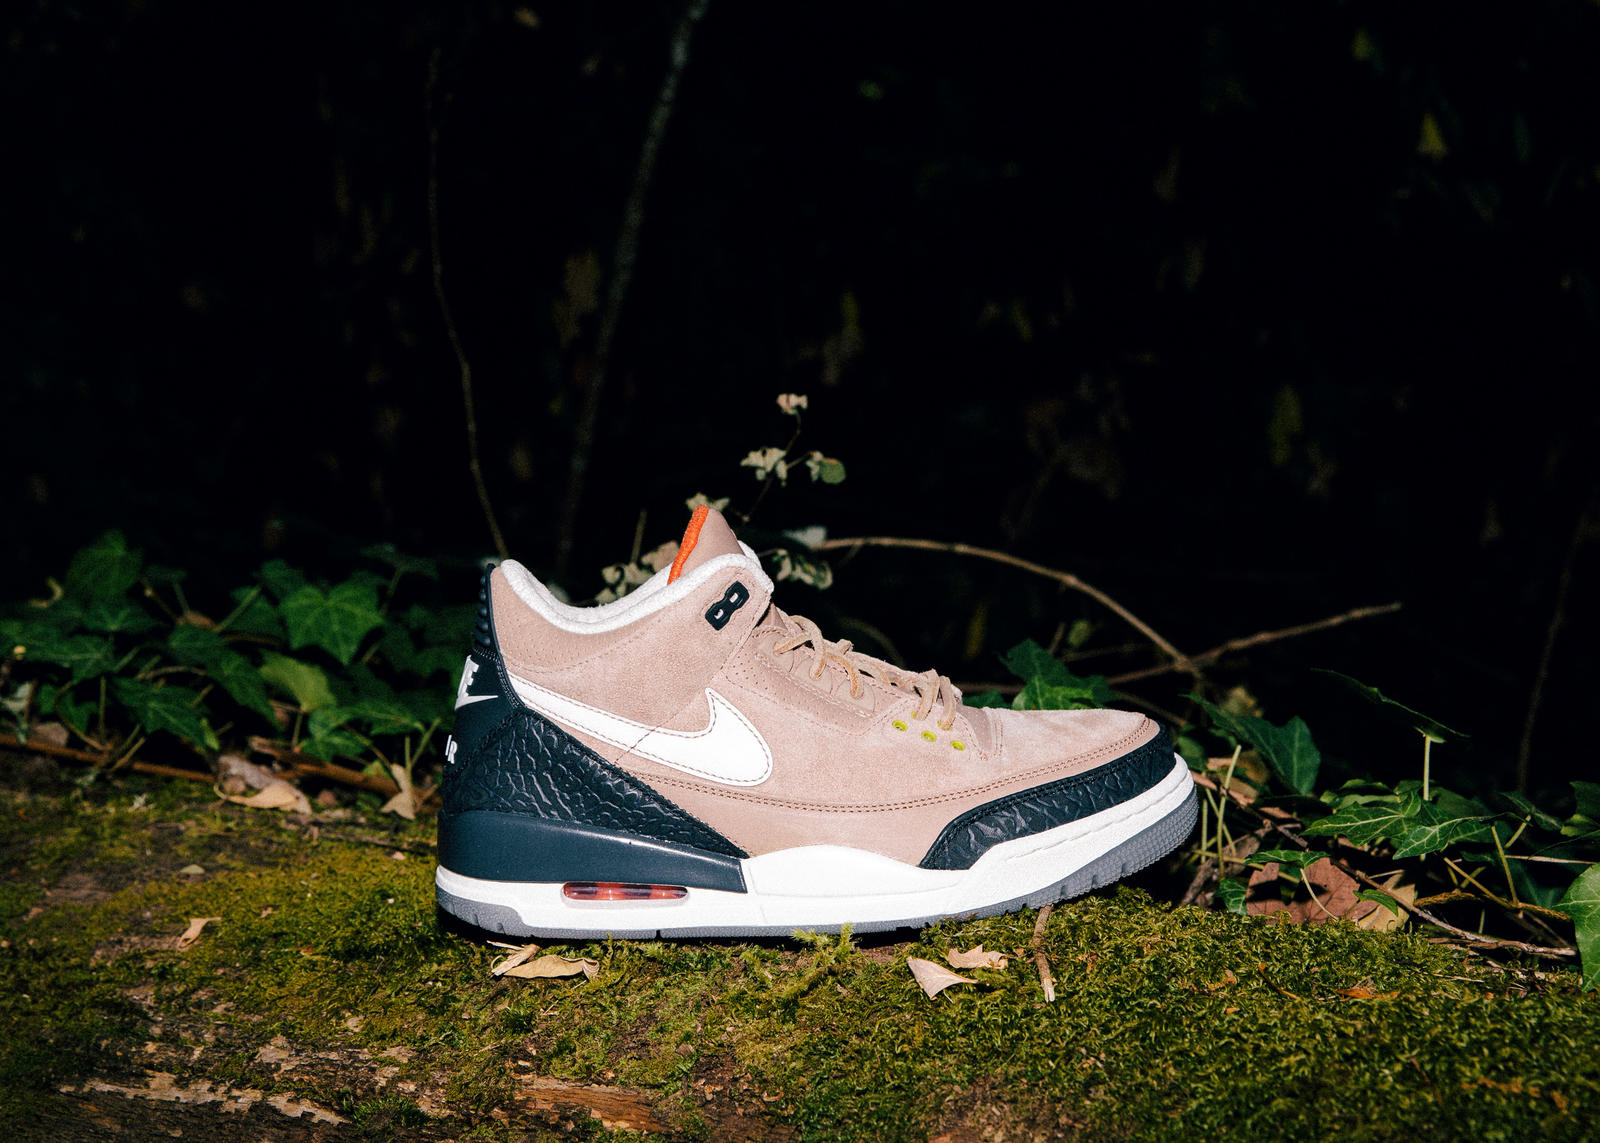 Air Jordan III JTH Nike News